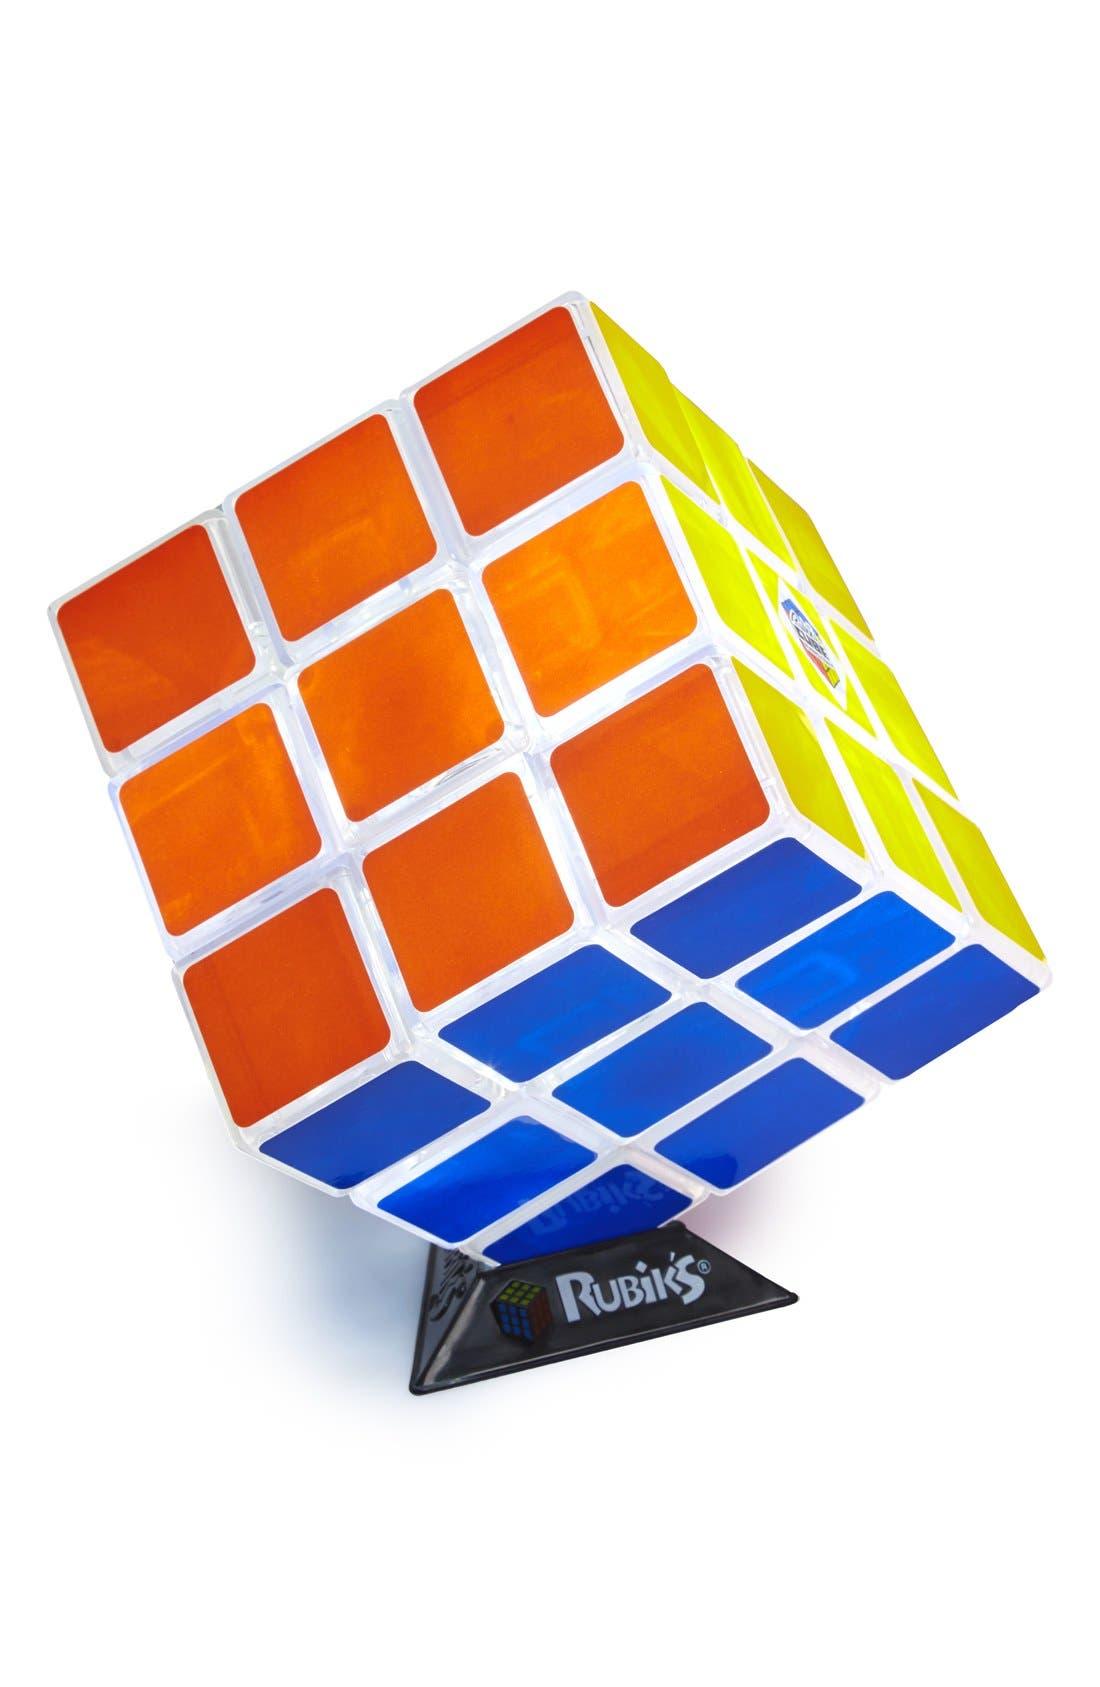 Paladone Rubik's Cube Light